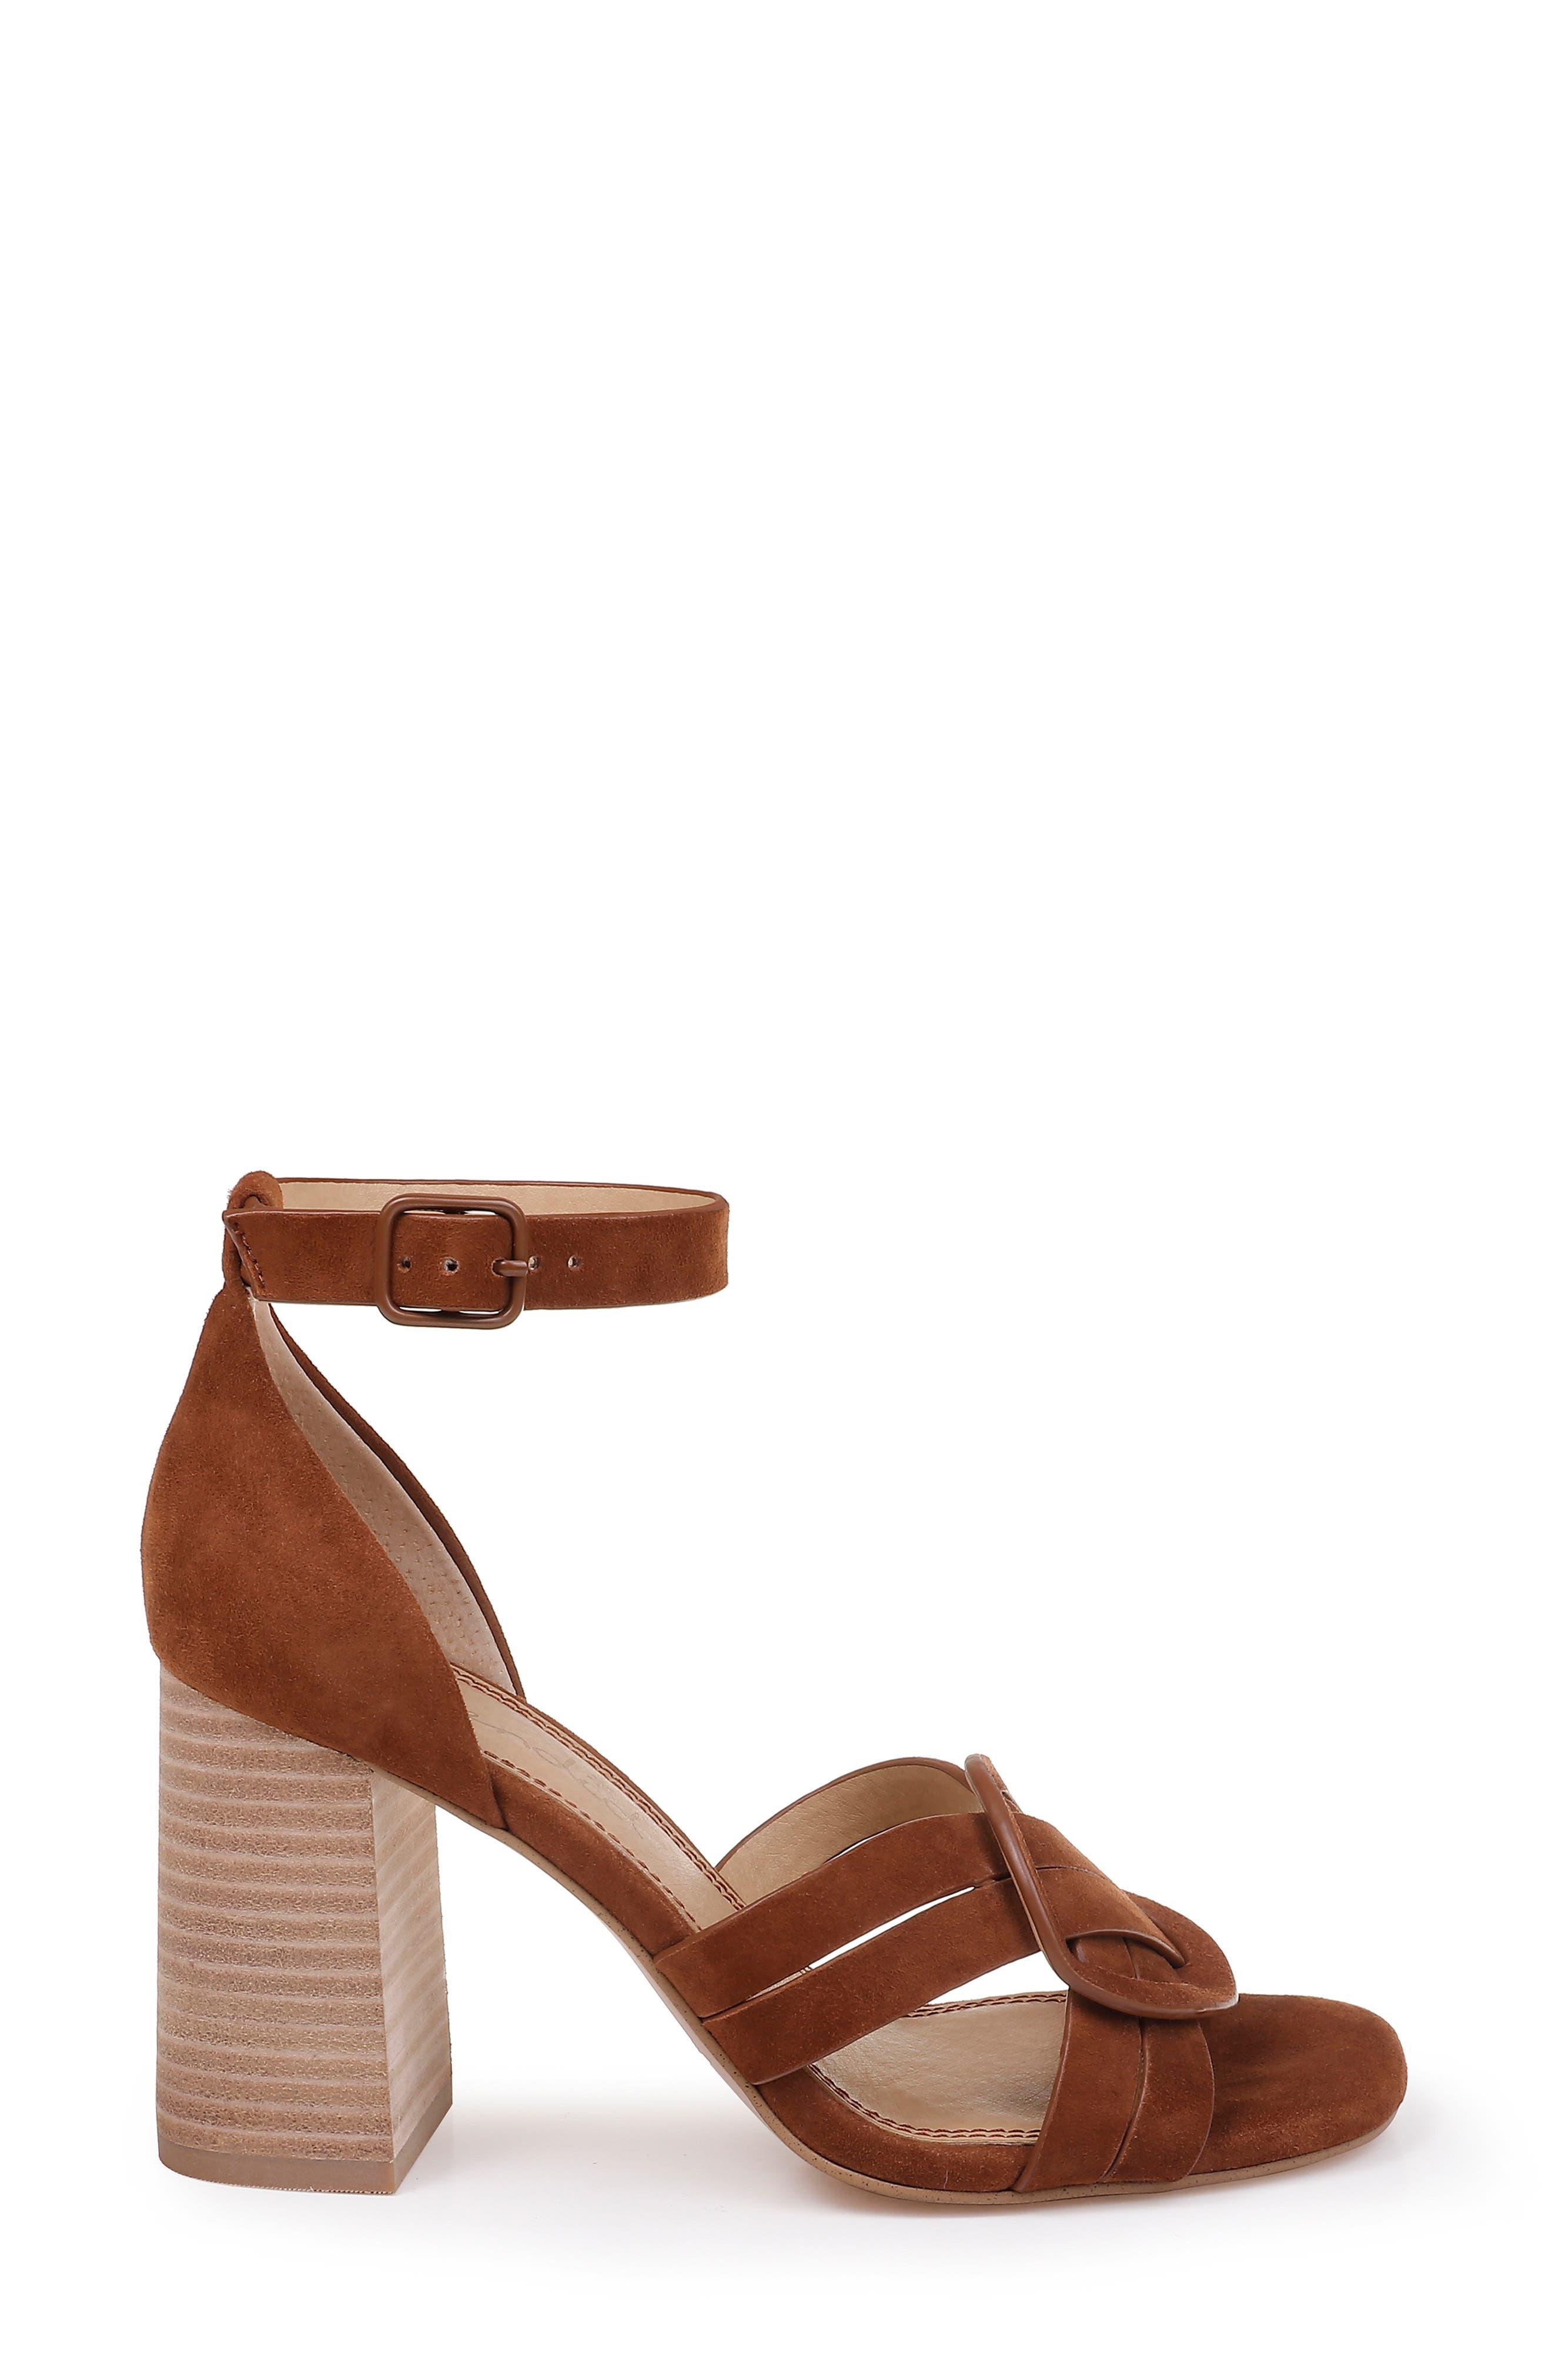 SPLENDID, Tallie Ankle Strap Sandal, Alternate thumbnail 3, color, CHESTNUT SUEDE